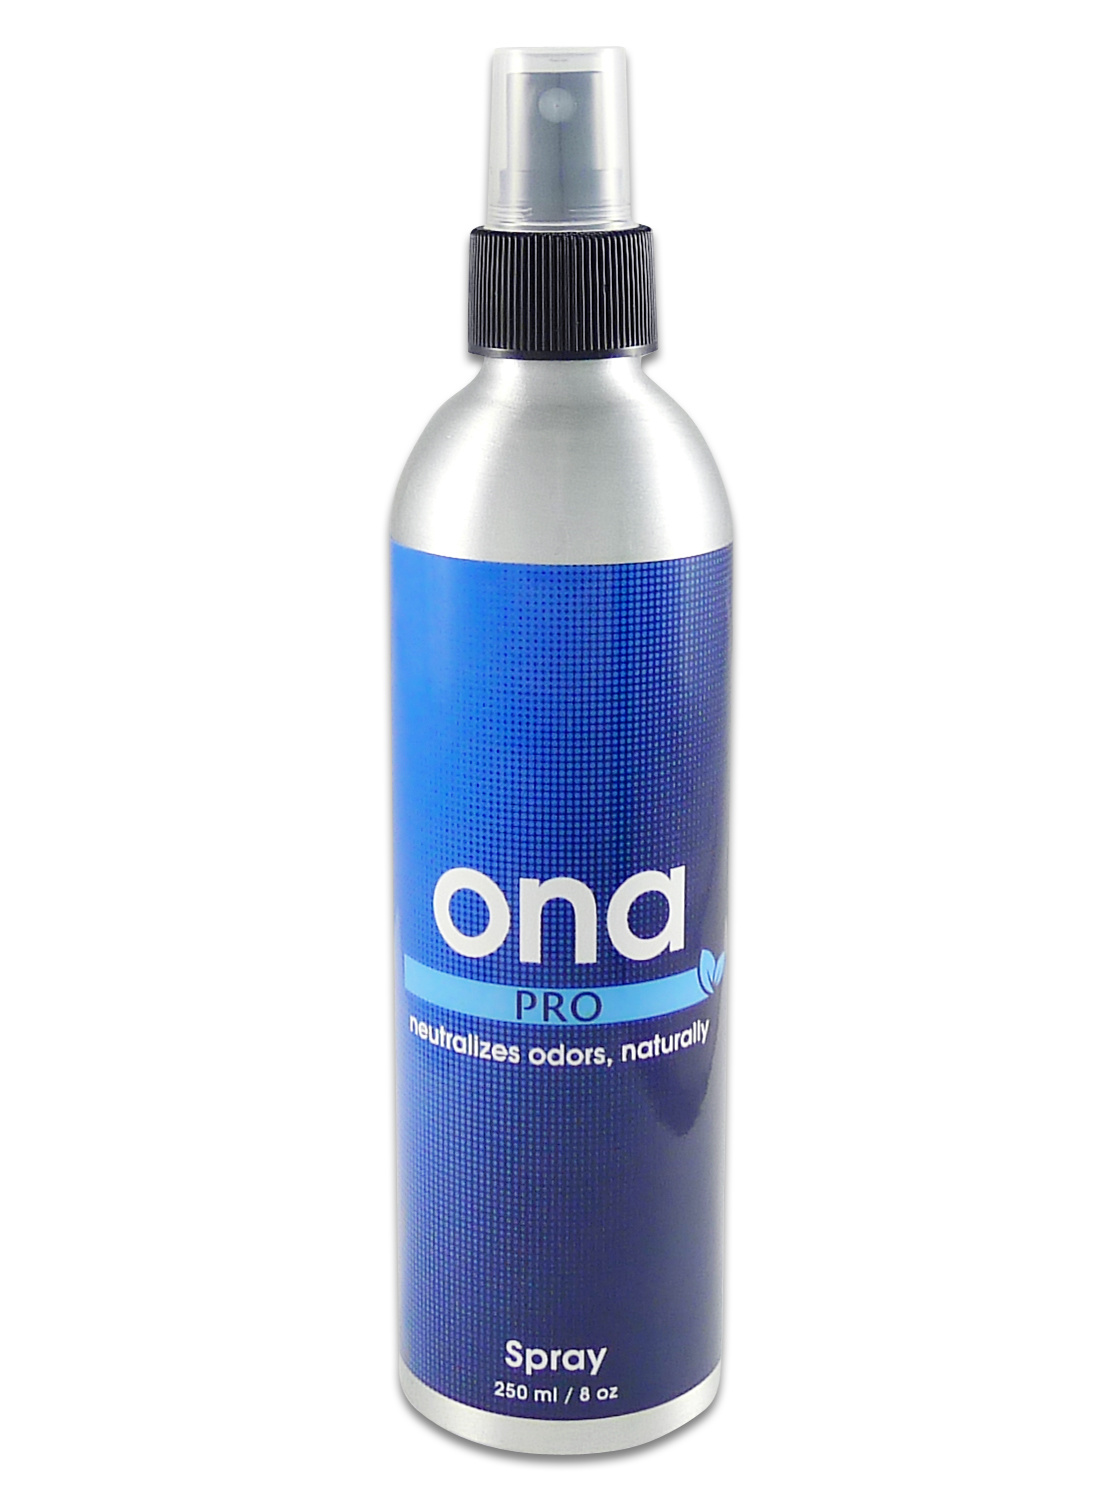 Spray 250mL